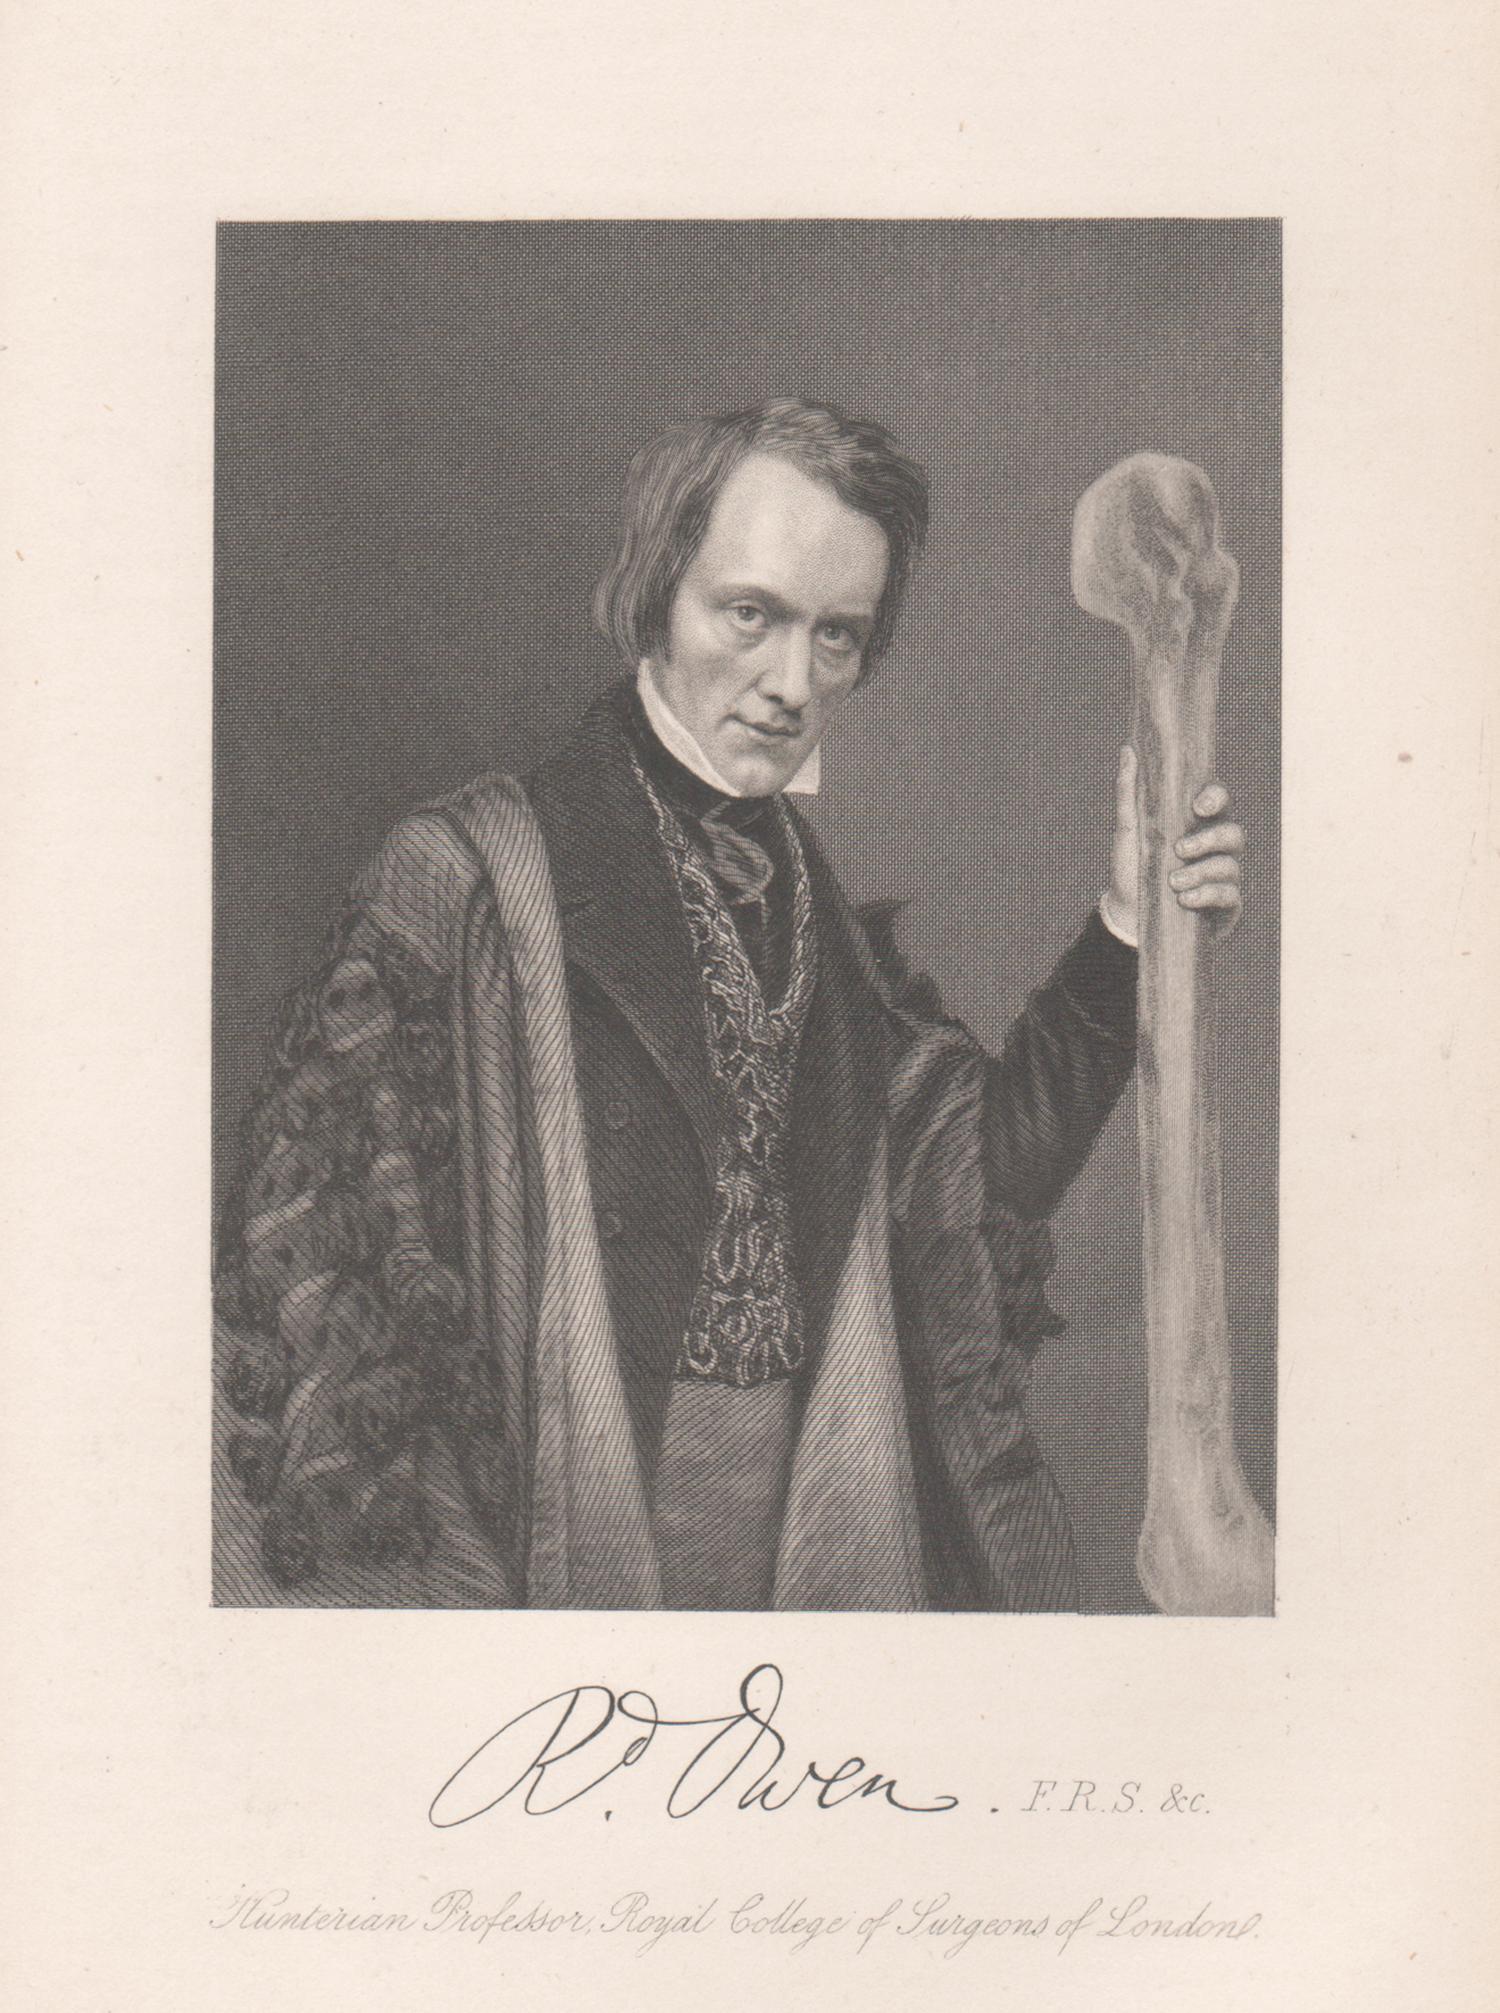 Sir Richard Owen, palaeontologist, portrait engraving, 1861